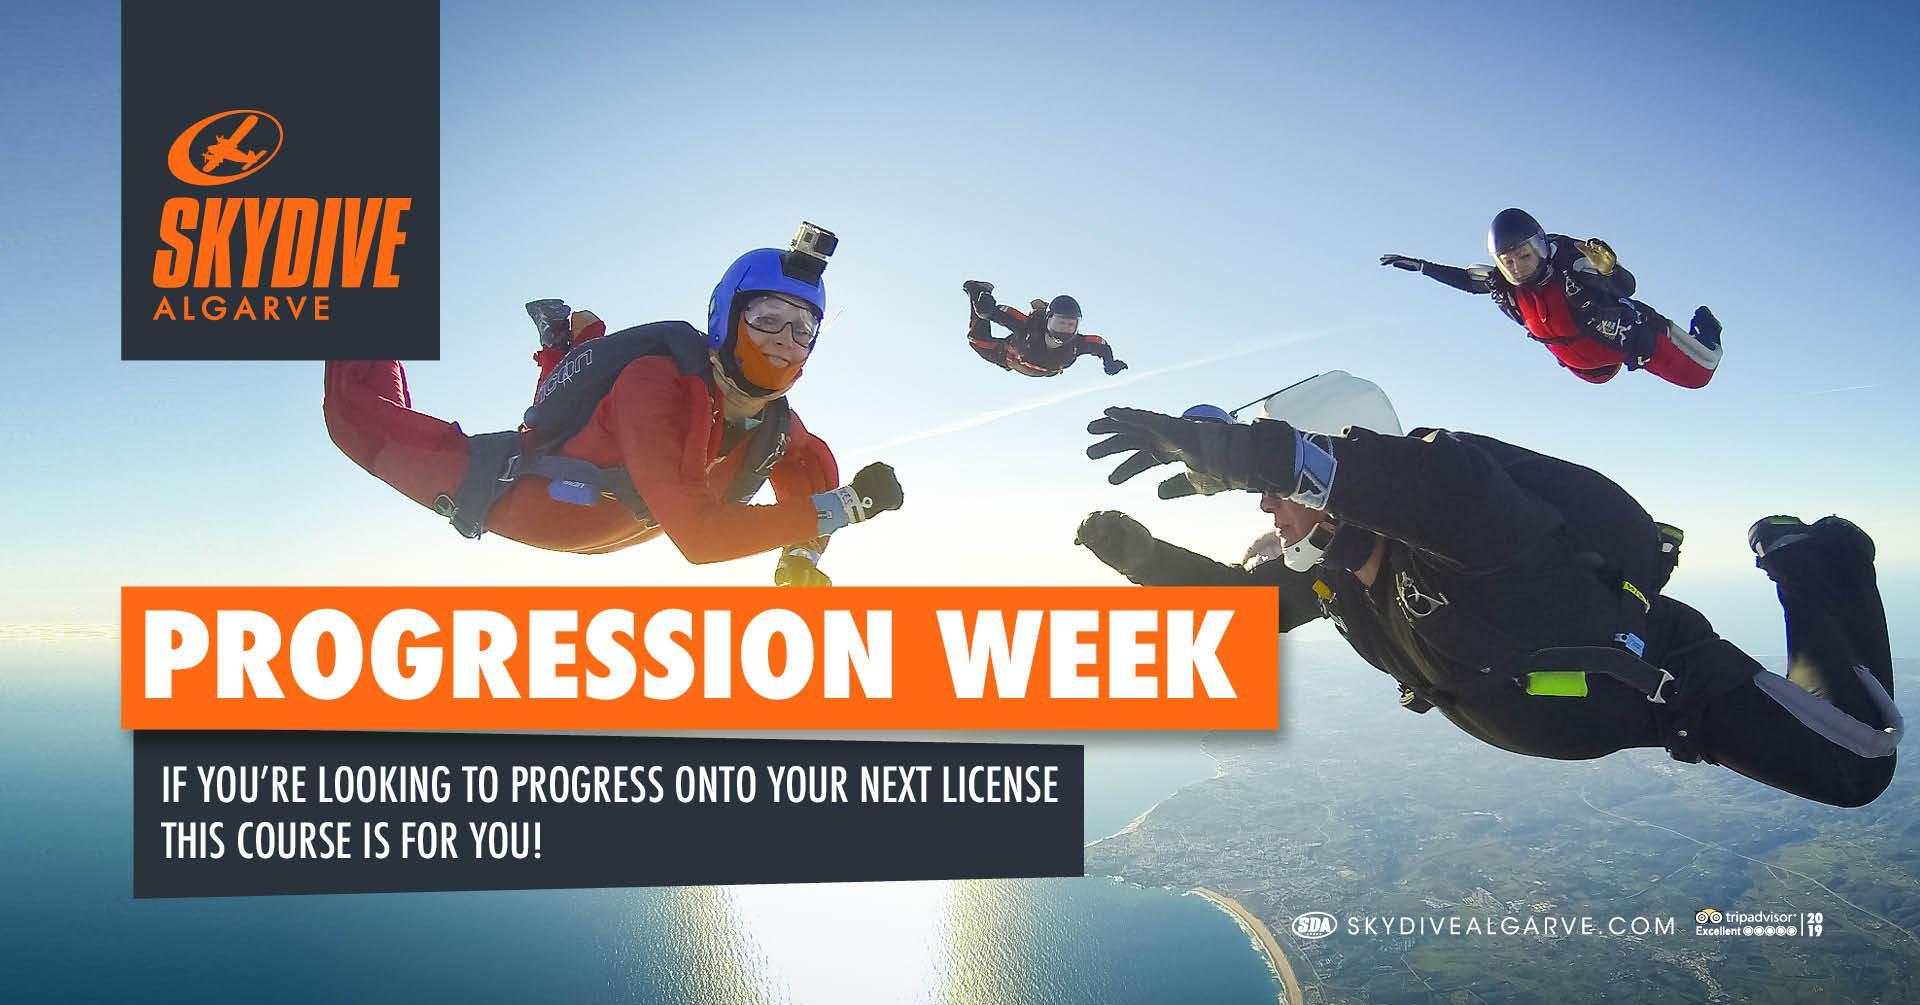 Progression Week